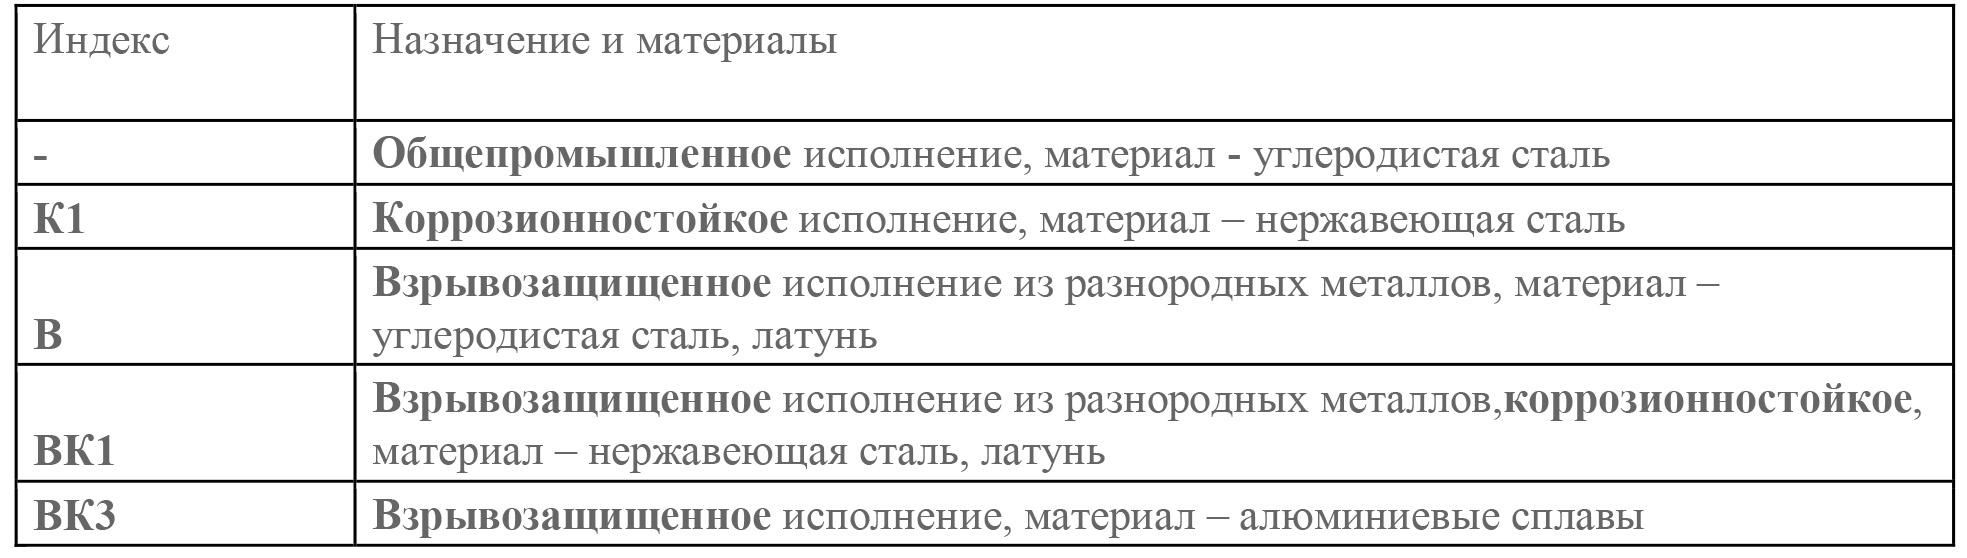 Документ Microsoft Word _2_